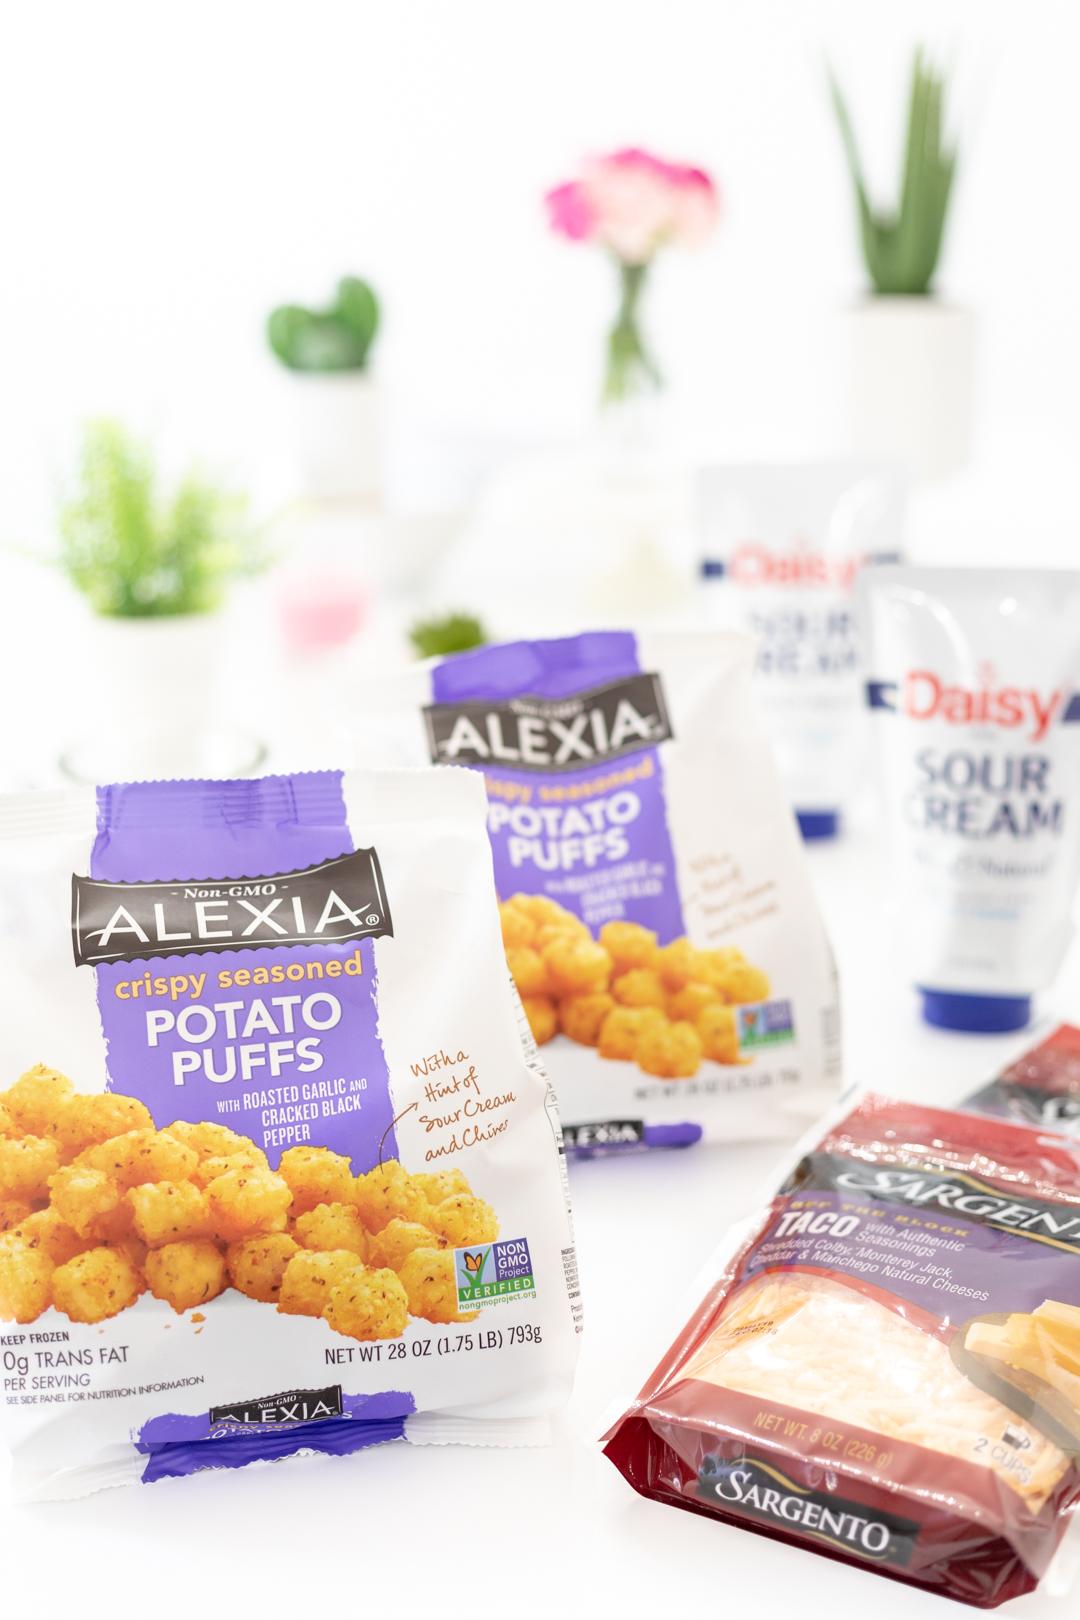 Alexia Potato Puffs